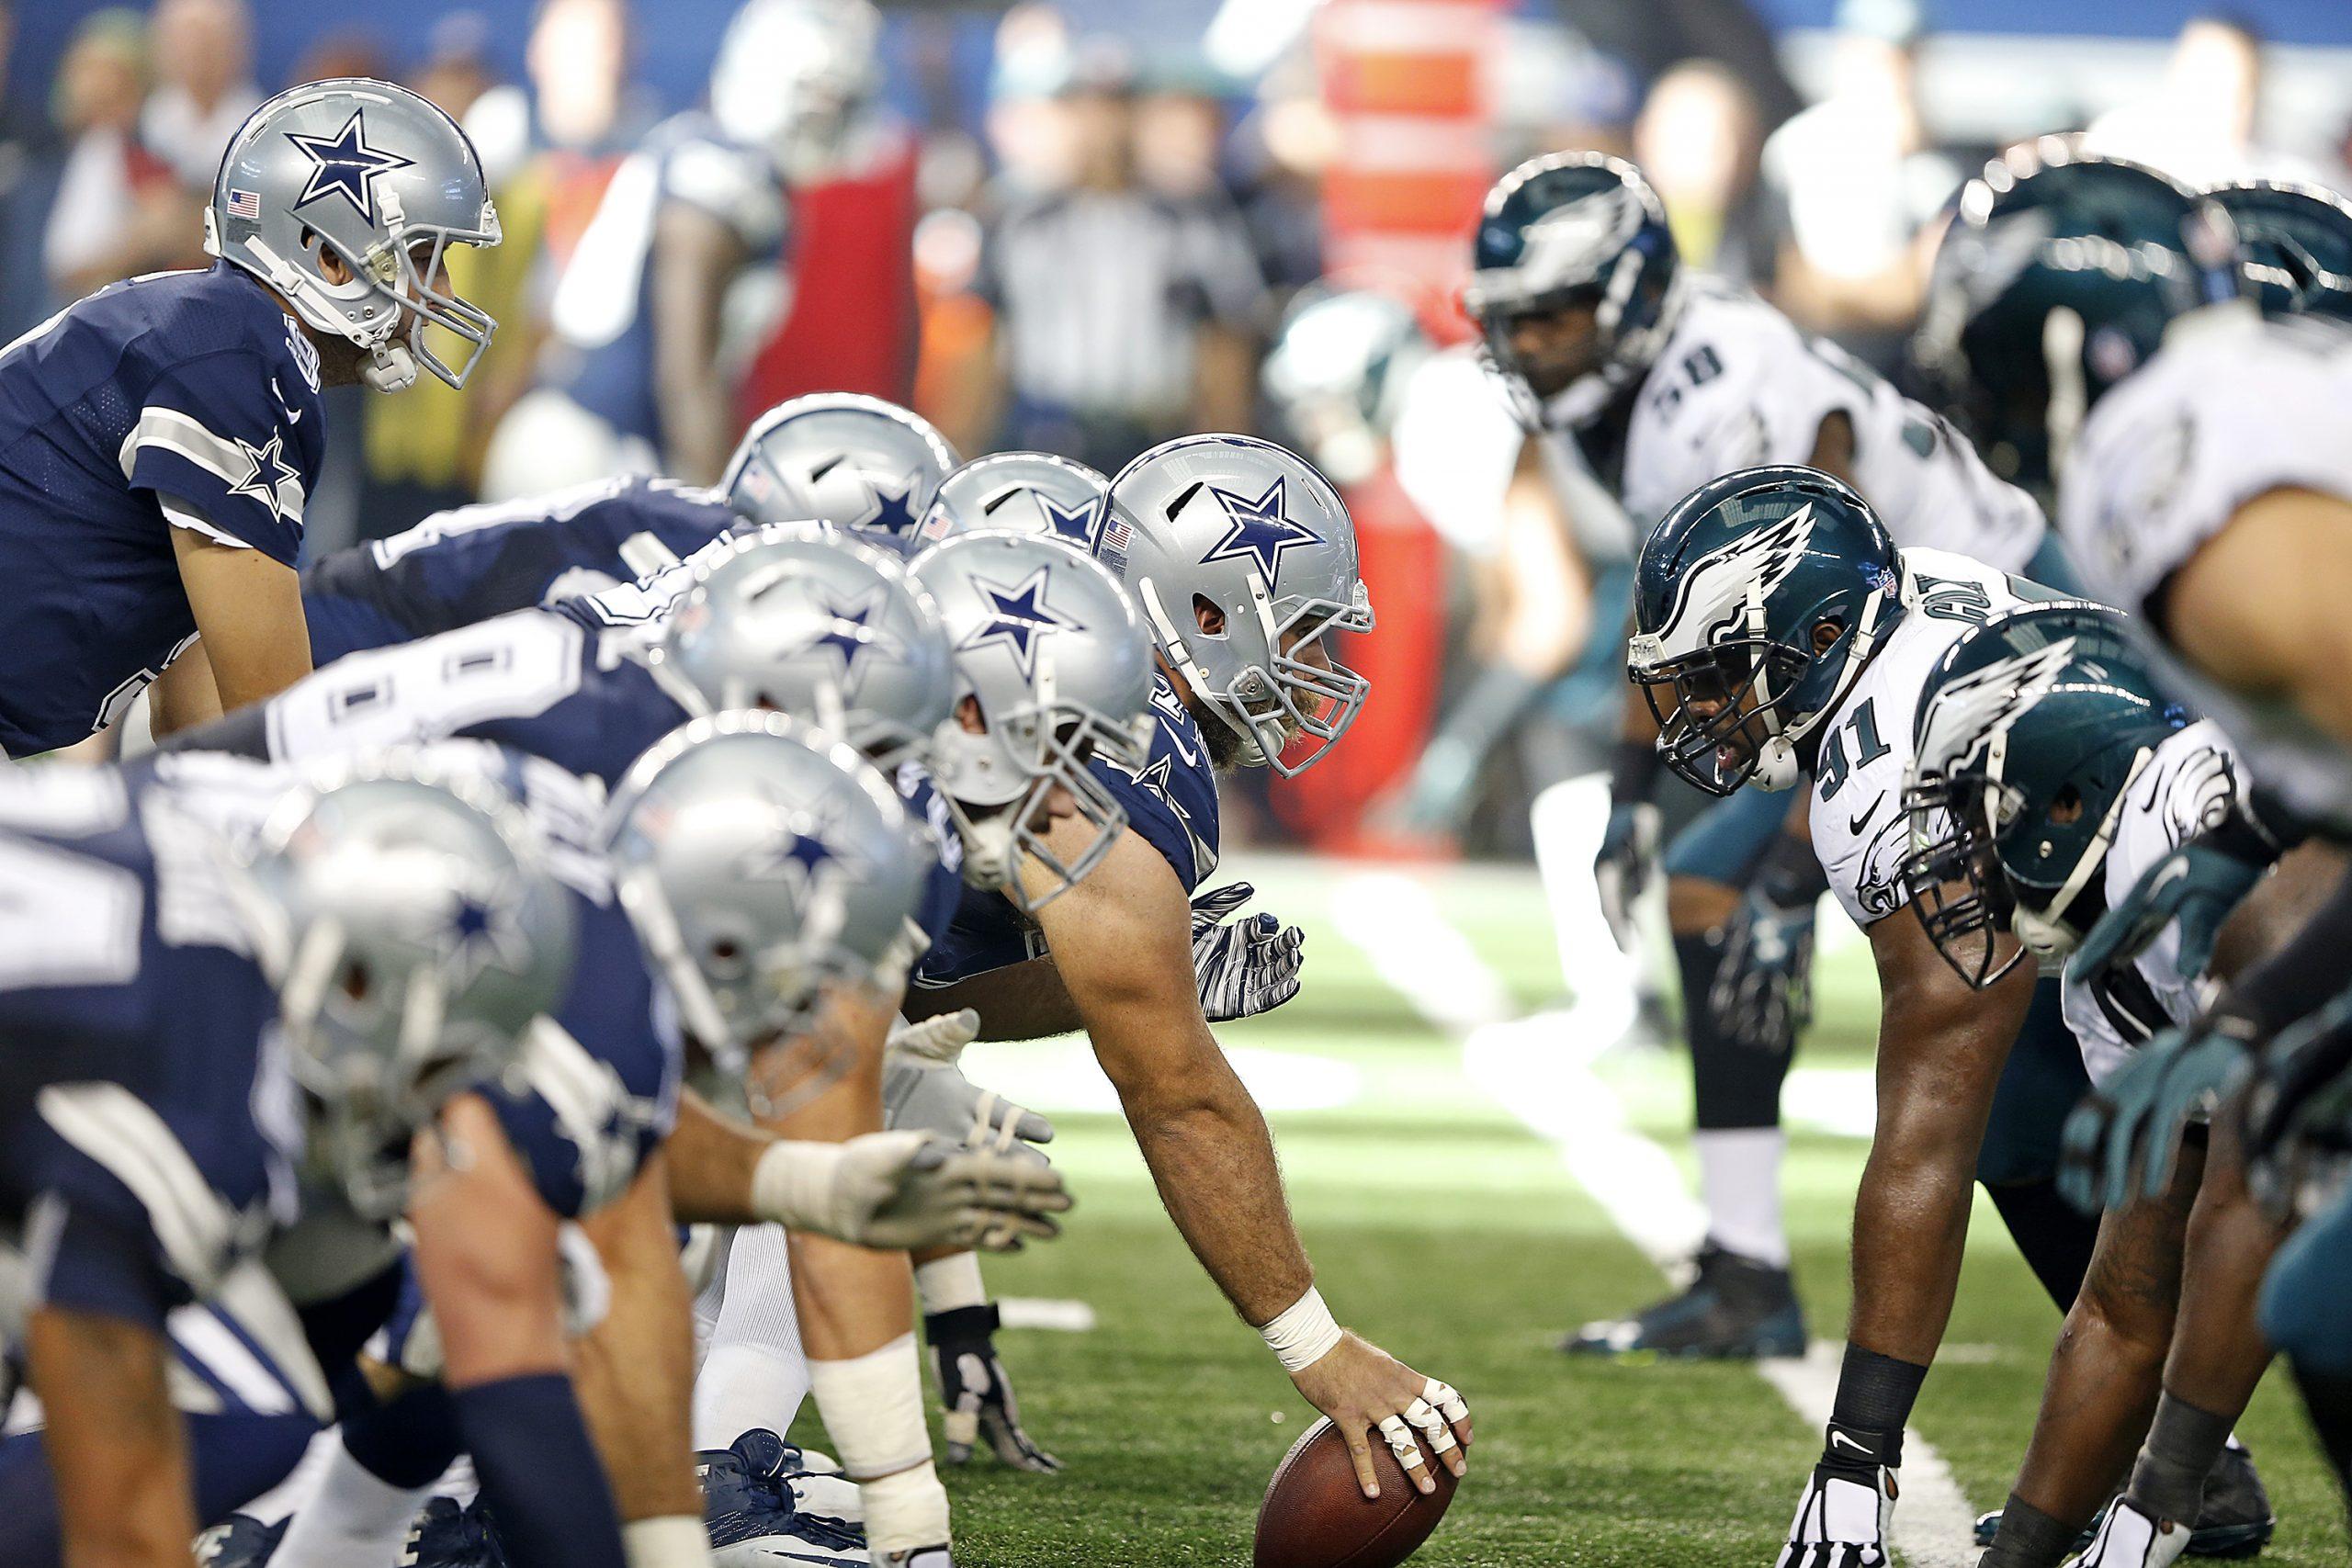 NFL Week 7 Odds - Pro Football Point Spreads